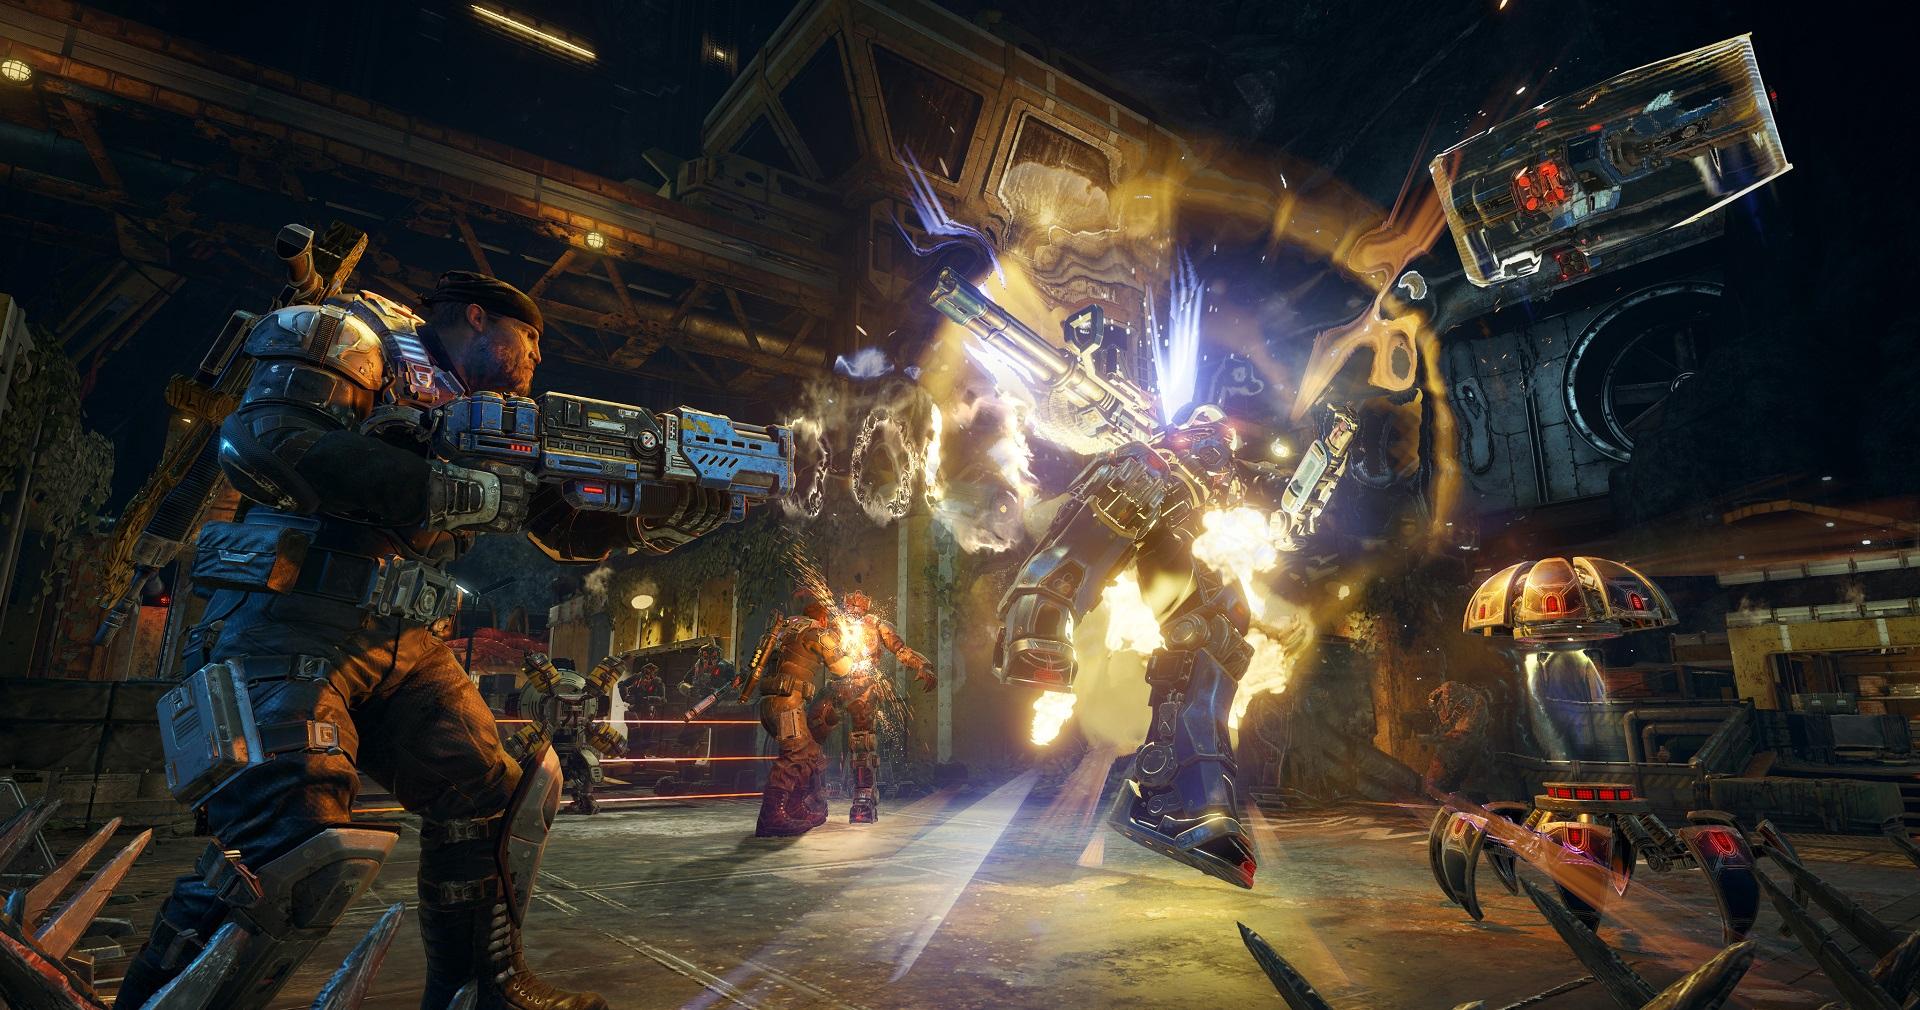 Gears of War 4 is getting a shorter Horde mode variant screenshot